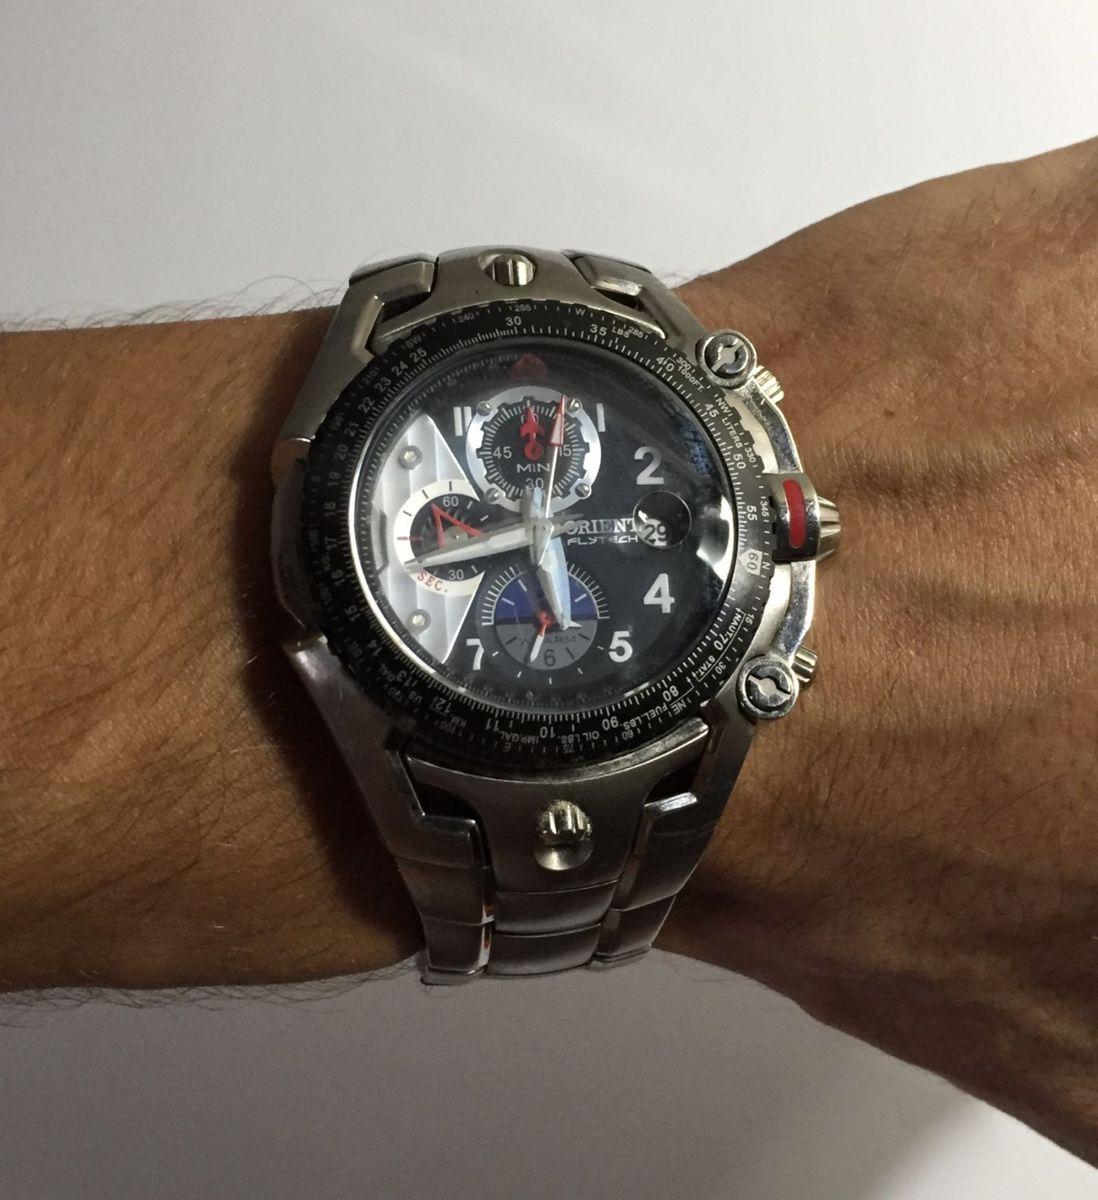 a8c6d814694 relógio titanium flytech orient - relógios orient